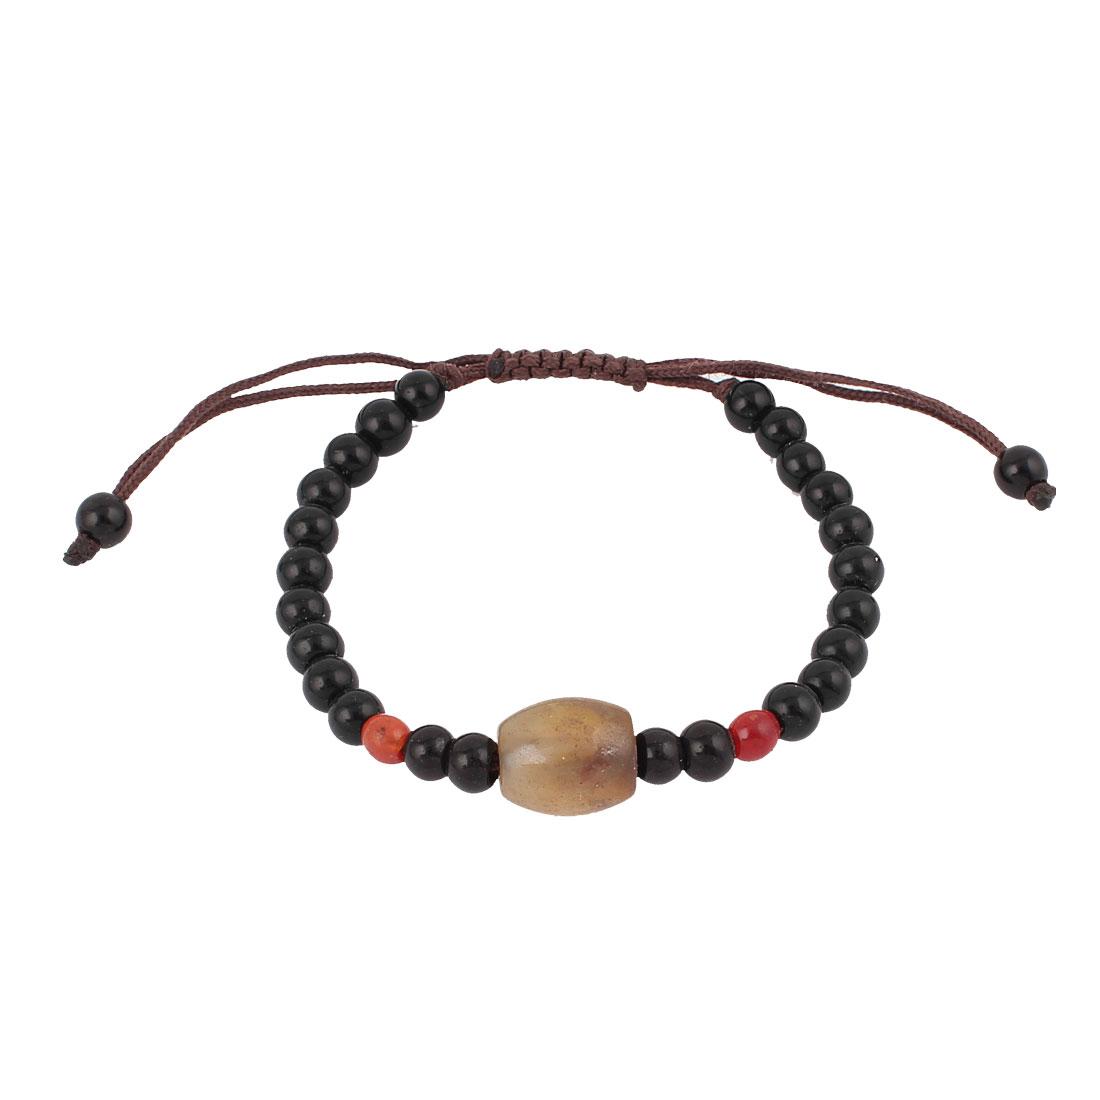 Tibetan Style DZI Beads Amulet Adjustable String Bangle Bracelet Black Brown